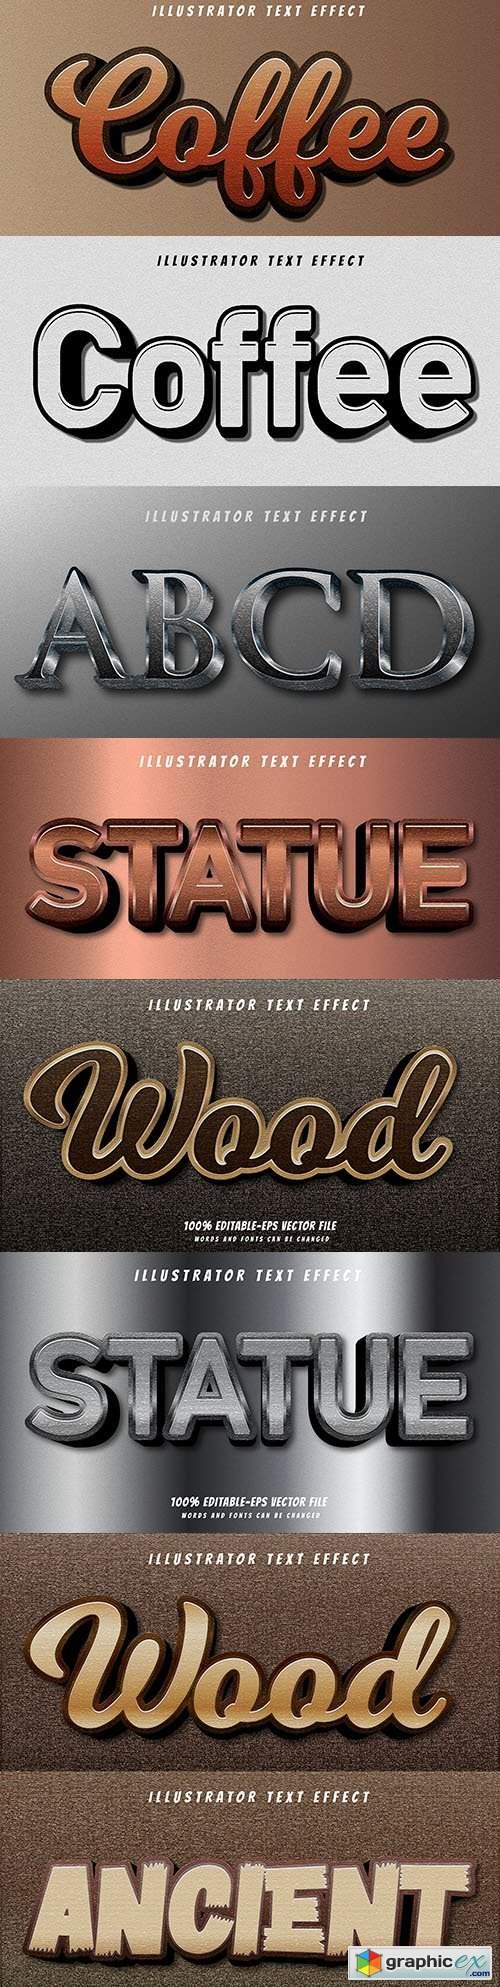 Editable font effect text collection illustration design 188